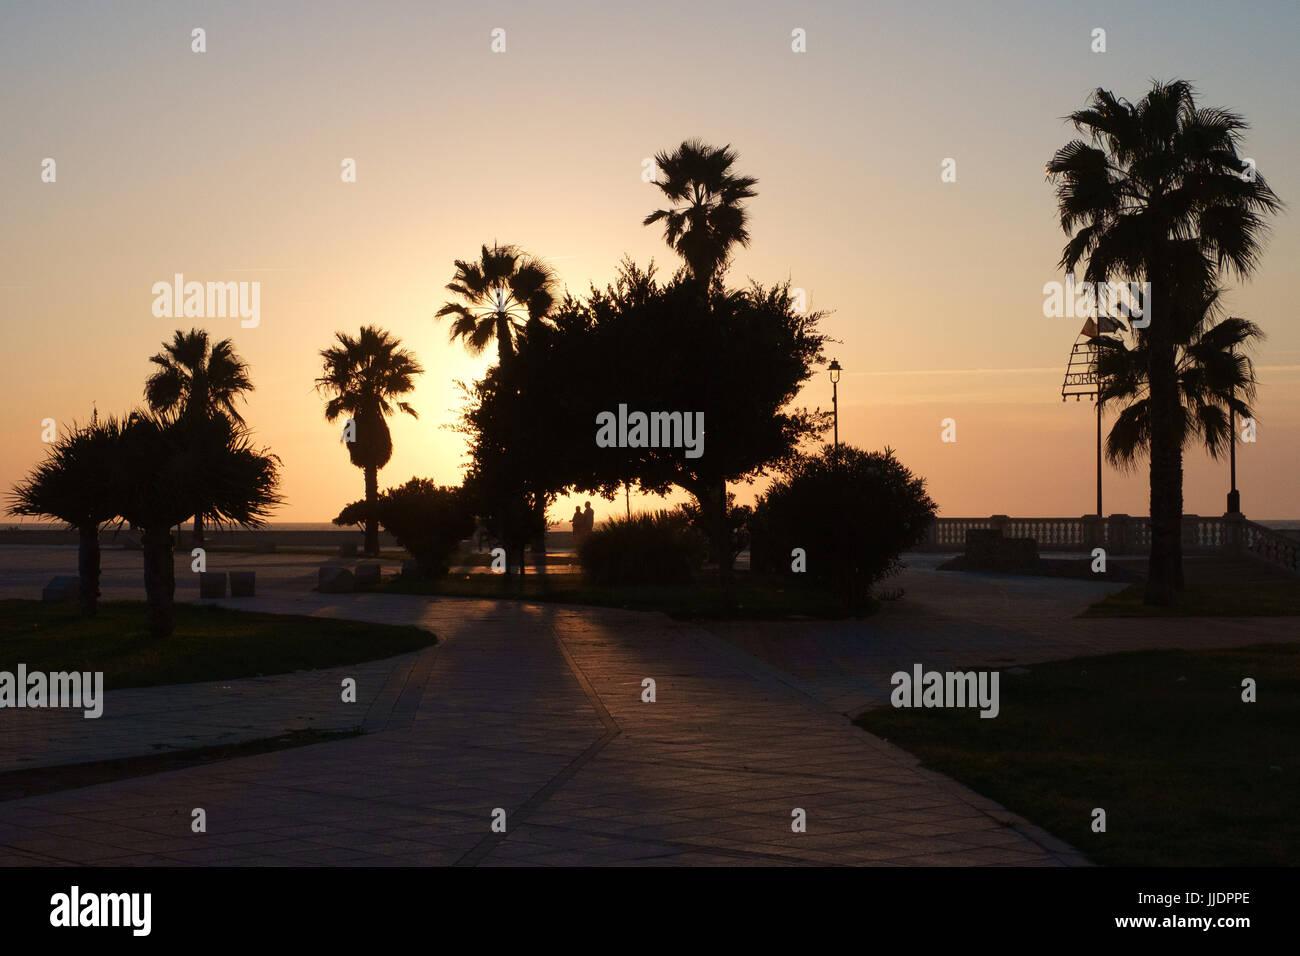 Sunset Stockamp; Fotos Chipiona Imágenes De At Tc3JKlF1